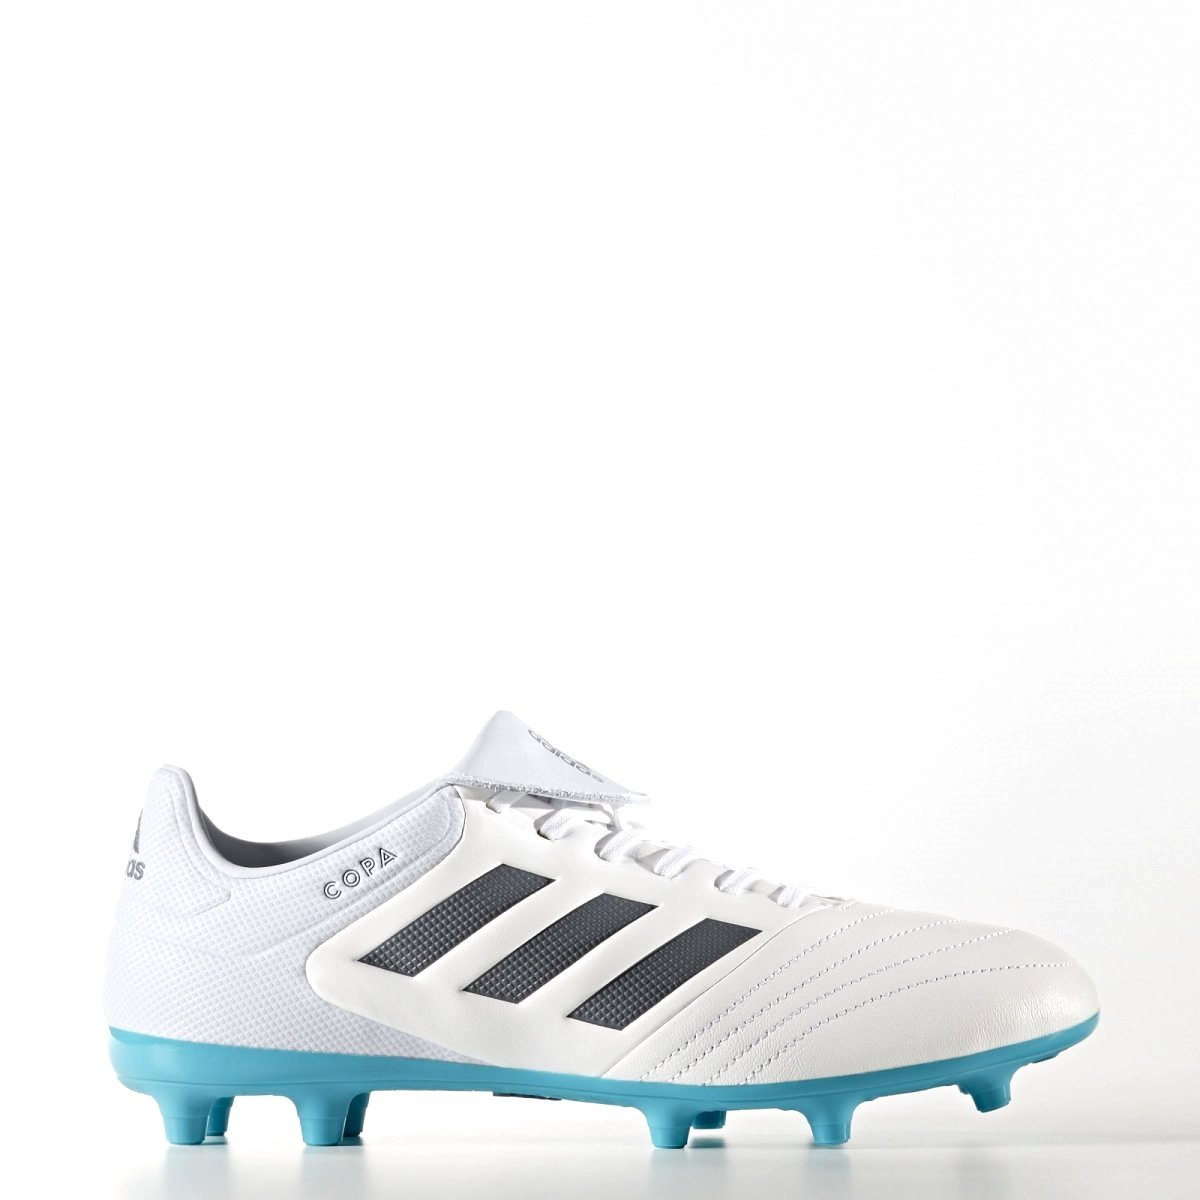 c49e6af2c Chuteira Campo Adidas Copa 17.3 FG S77141 Branco Turquesa